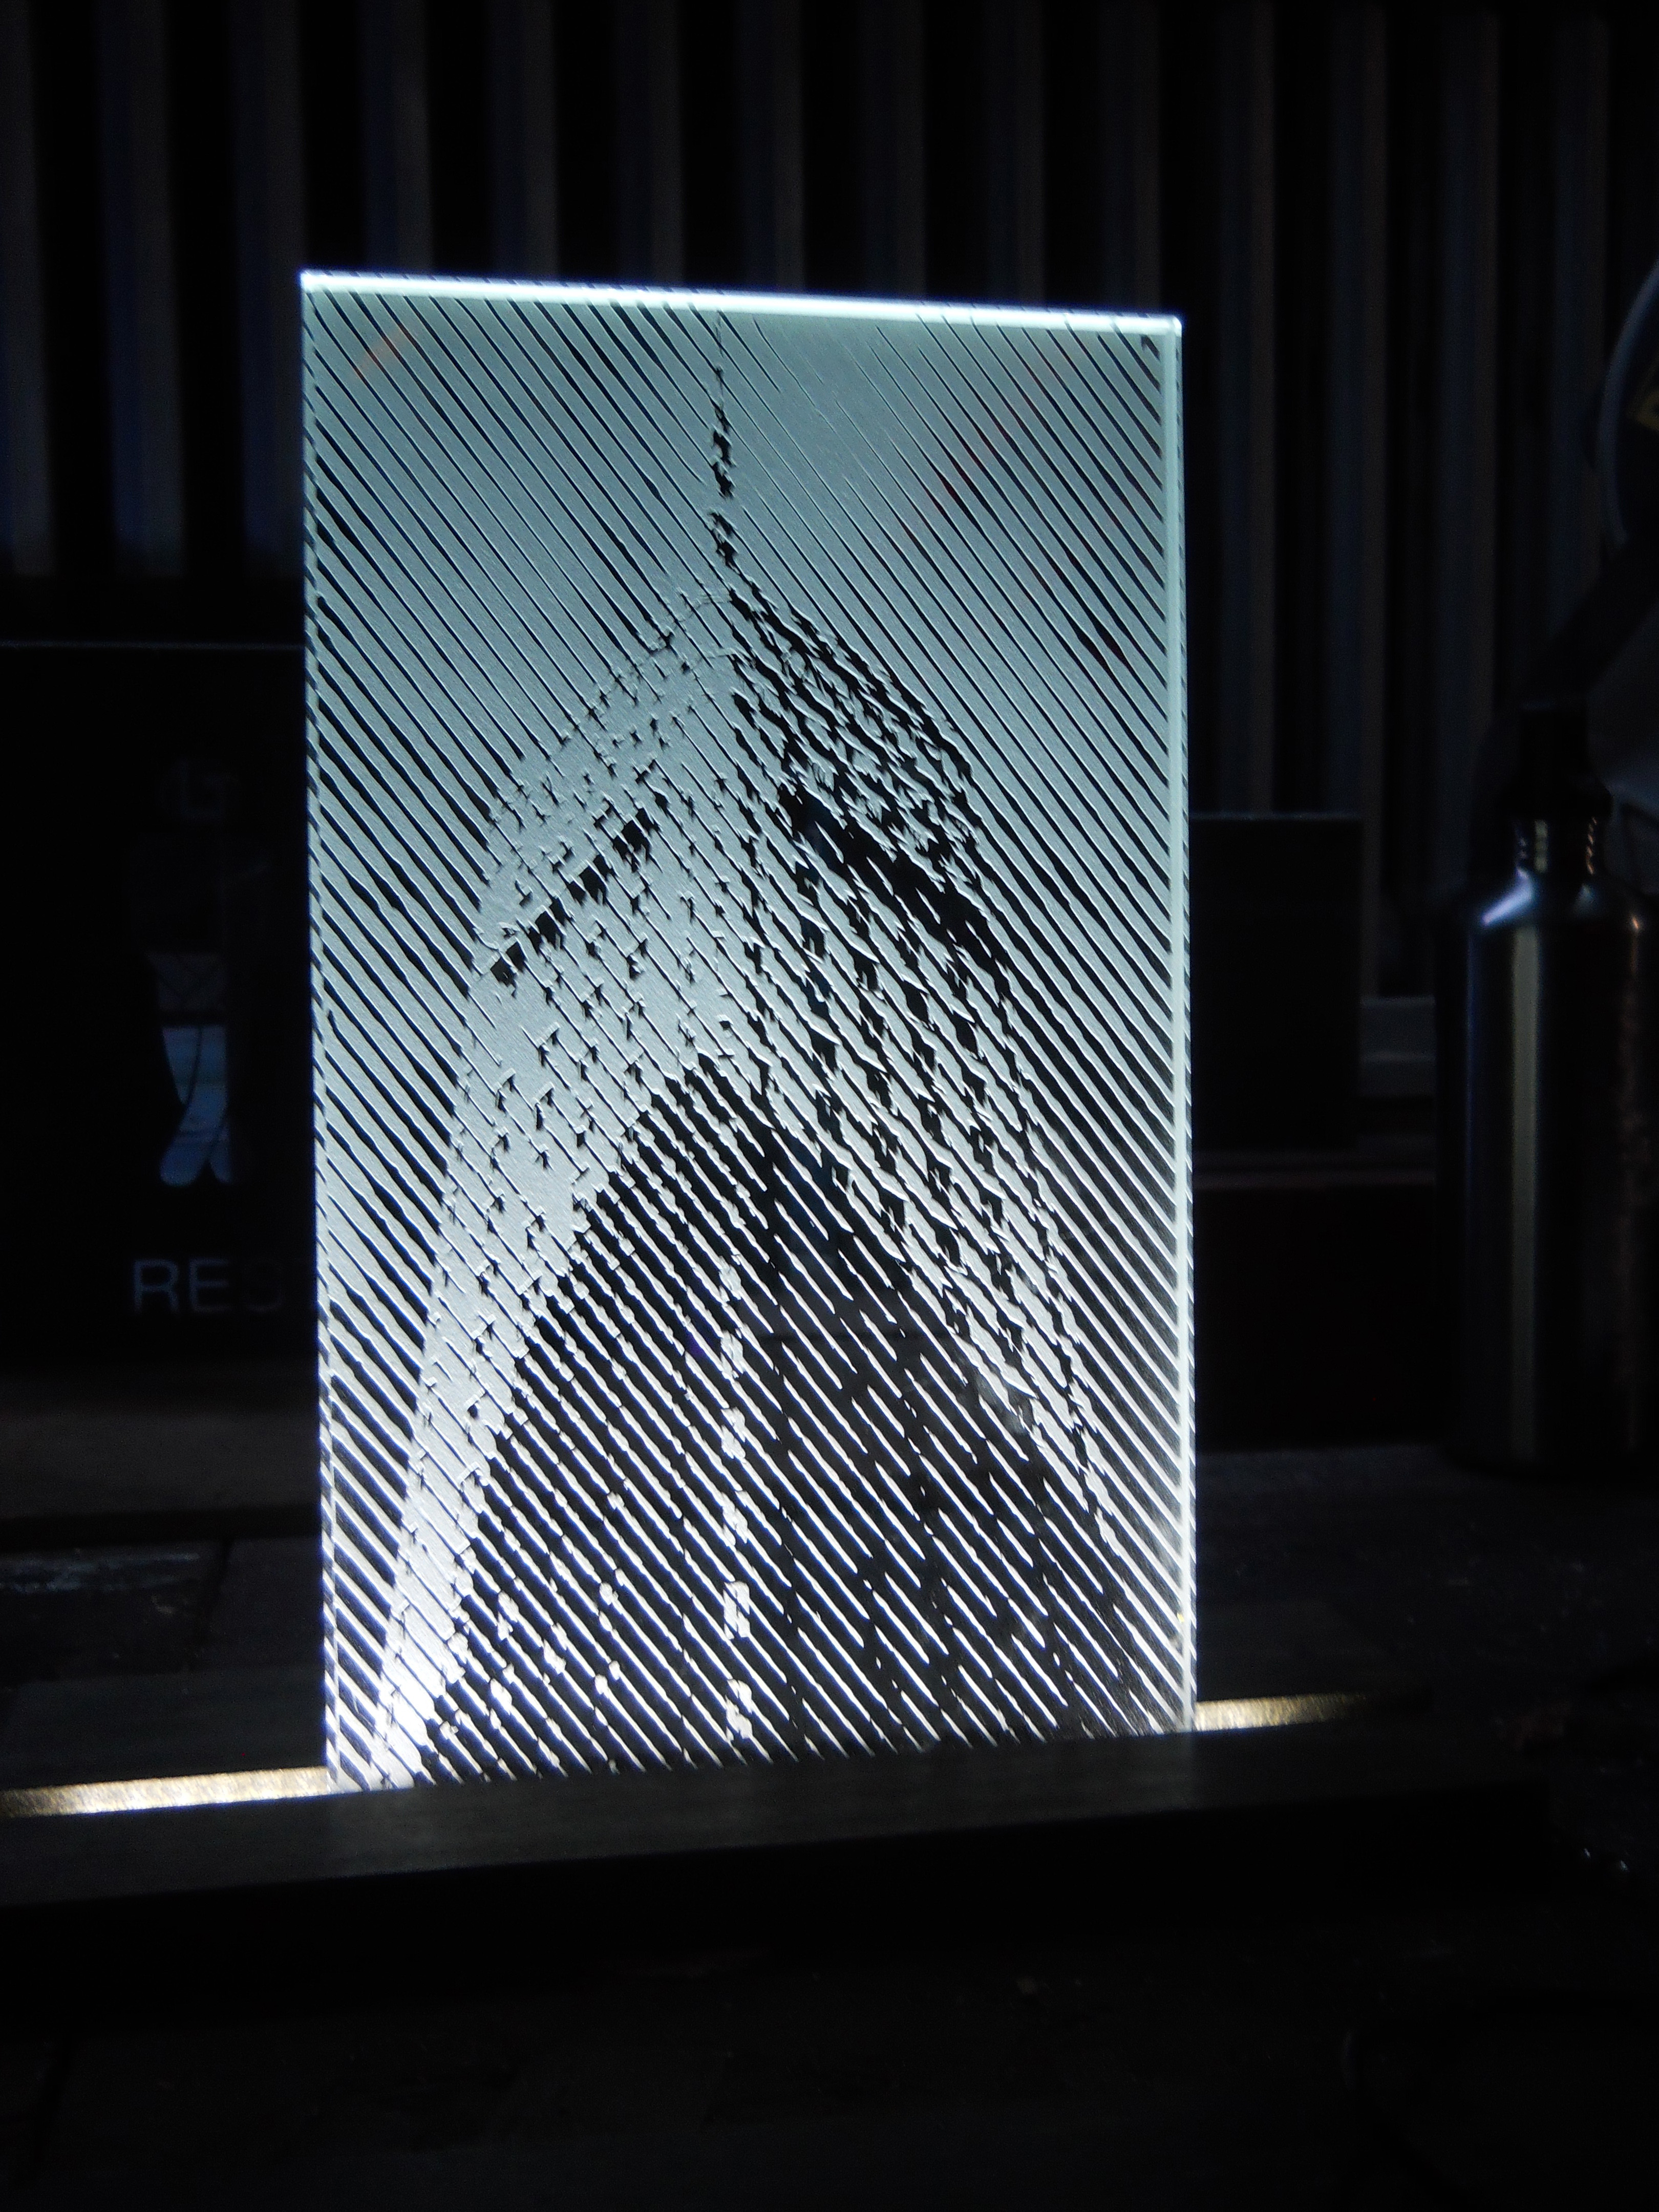 Foshay tower on glass